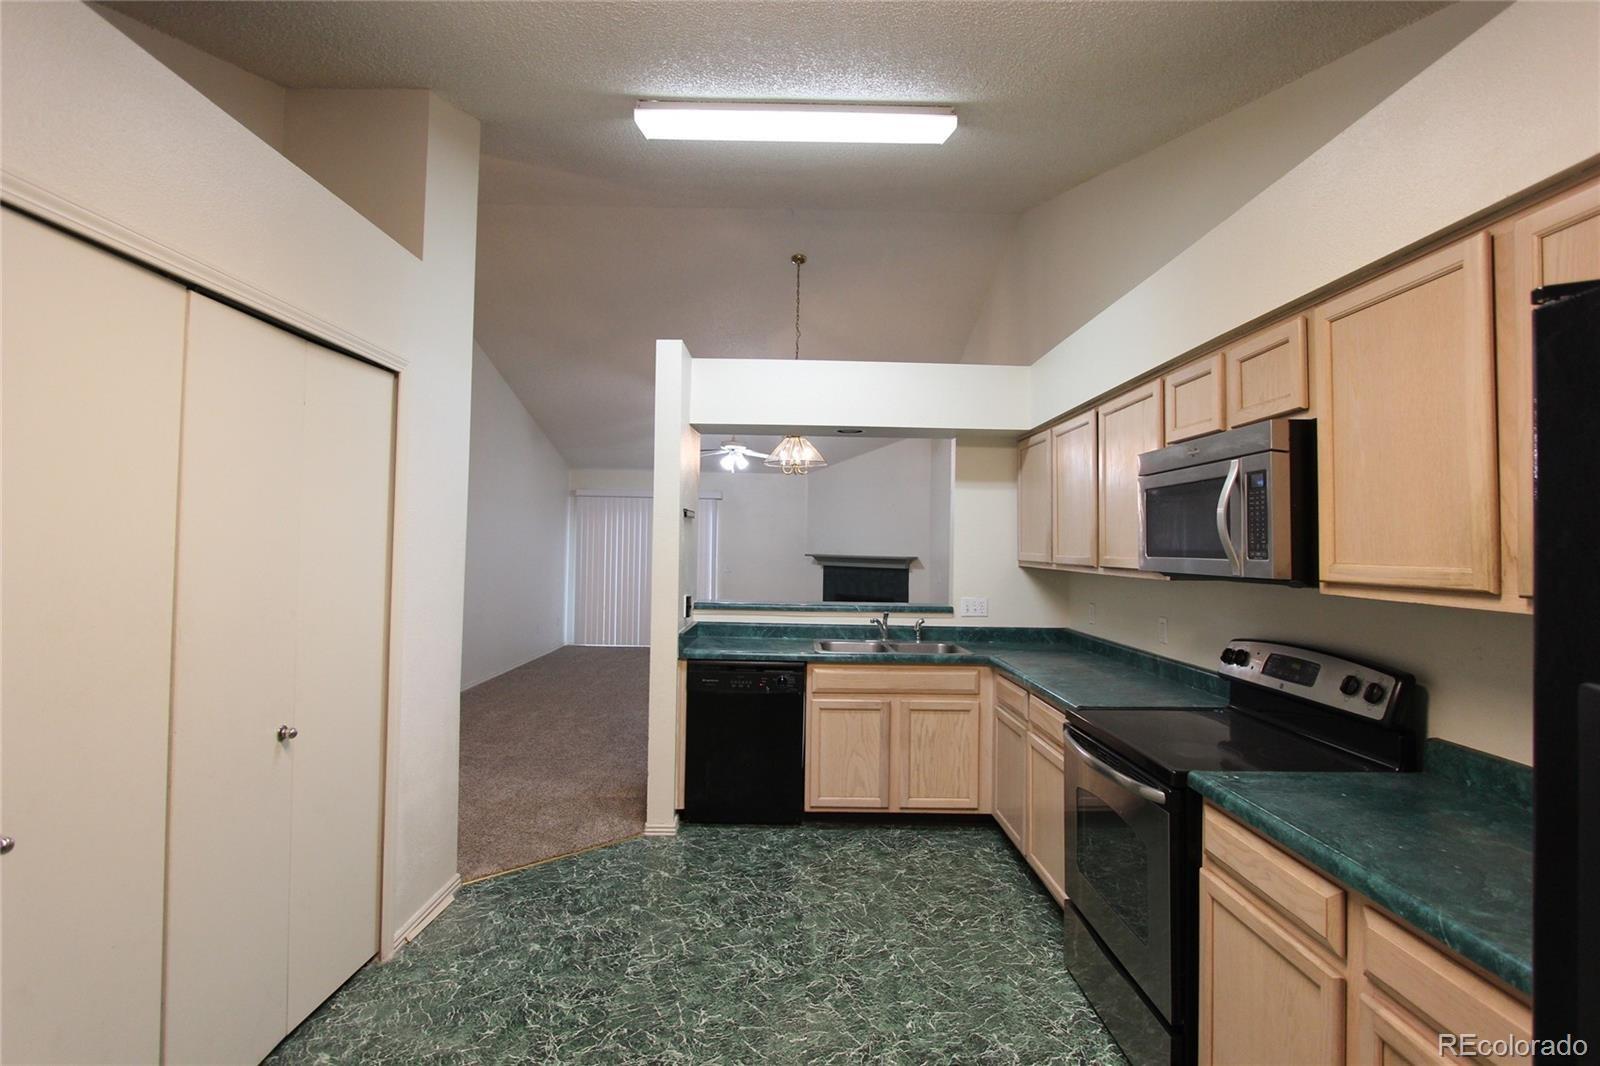 MLS# 5416526 - 1 - 1675  S Canoe Creek Drive, Colorado Springs, CO 80906